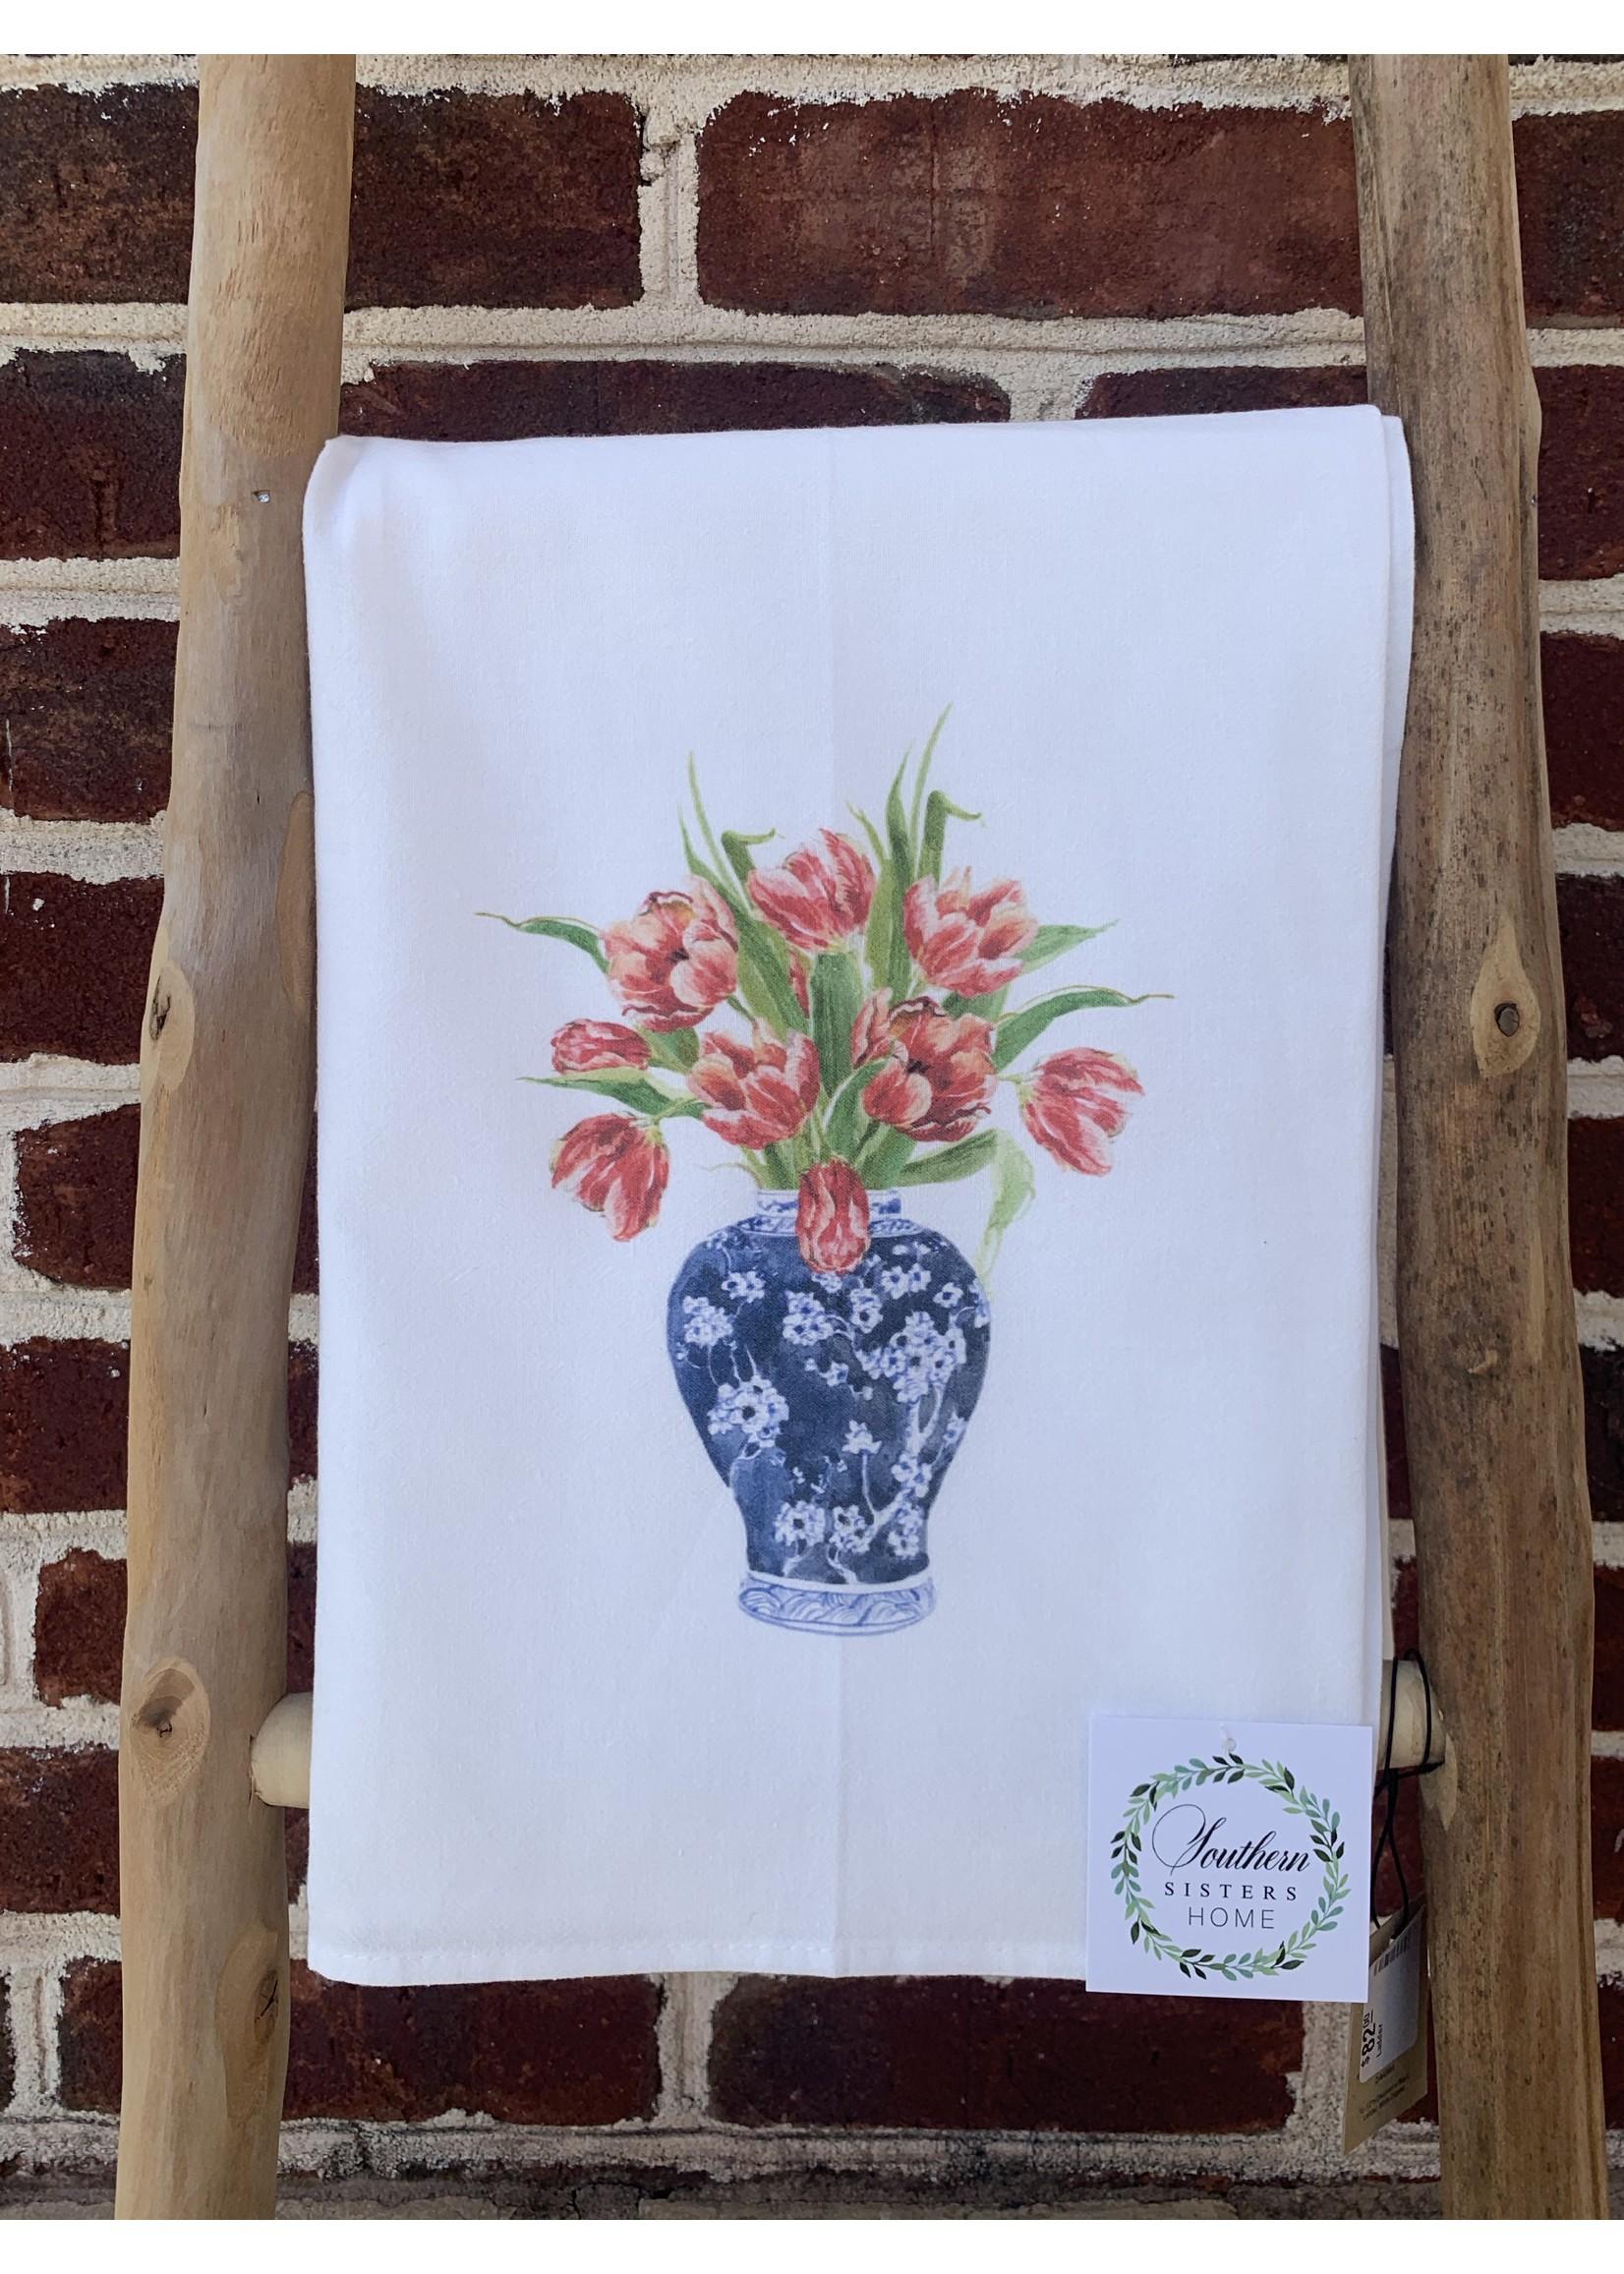 southern sisters Linen Towel Flowers in Vase